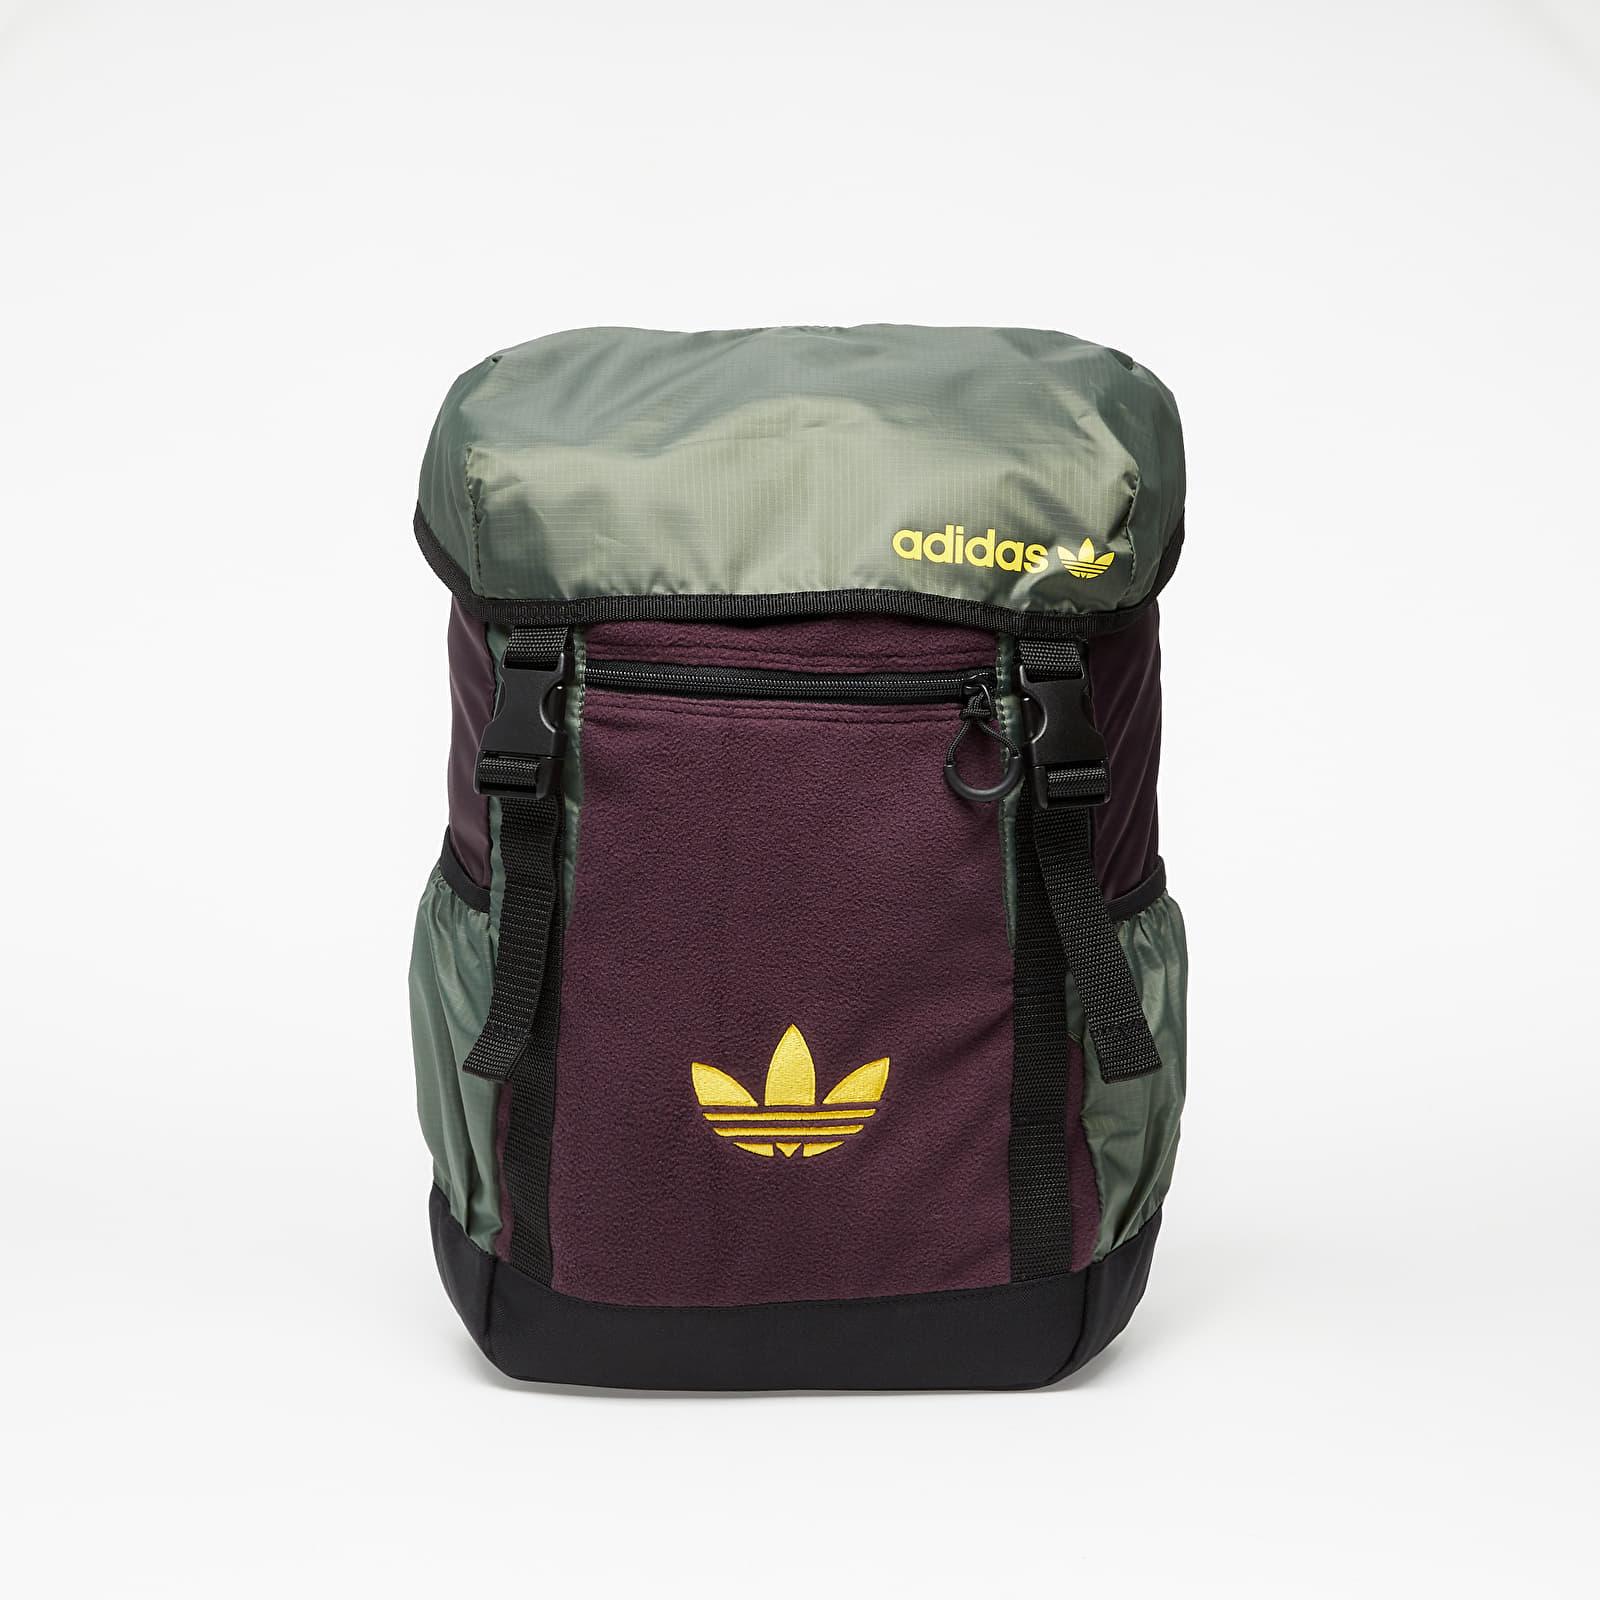 adidas Premium Essentials Toploader Backpack Minred/ Basgrn EUR